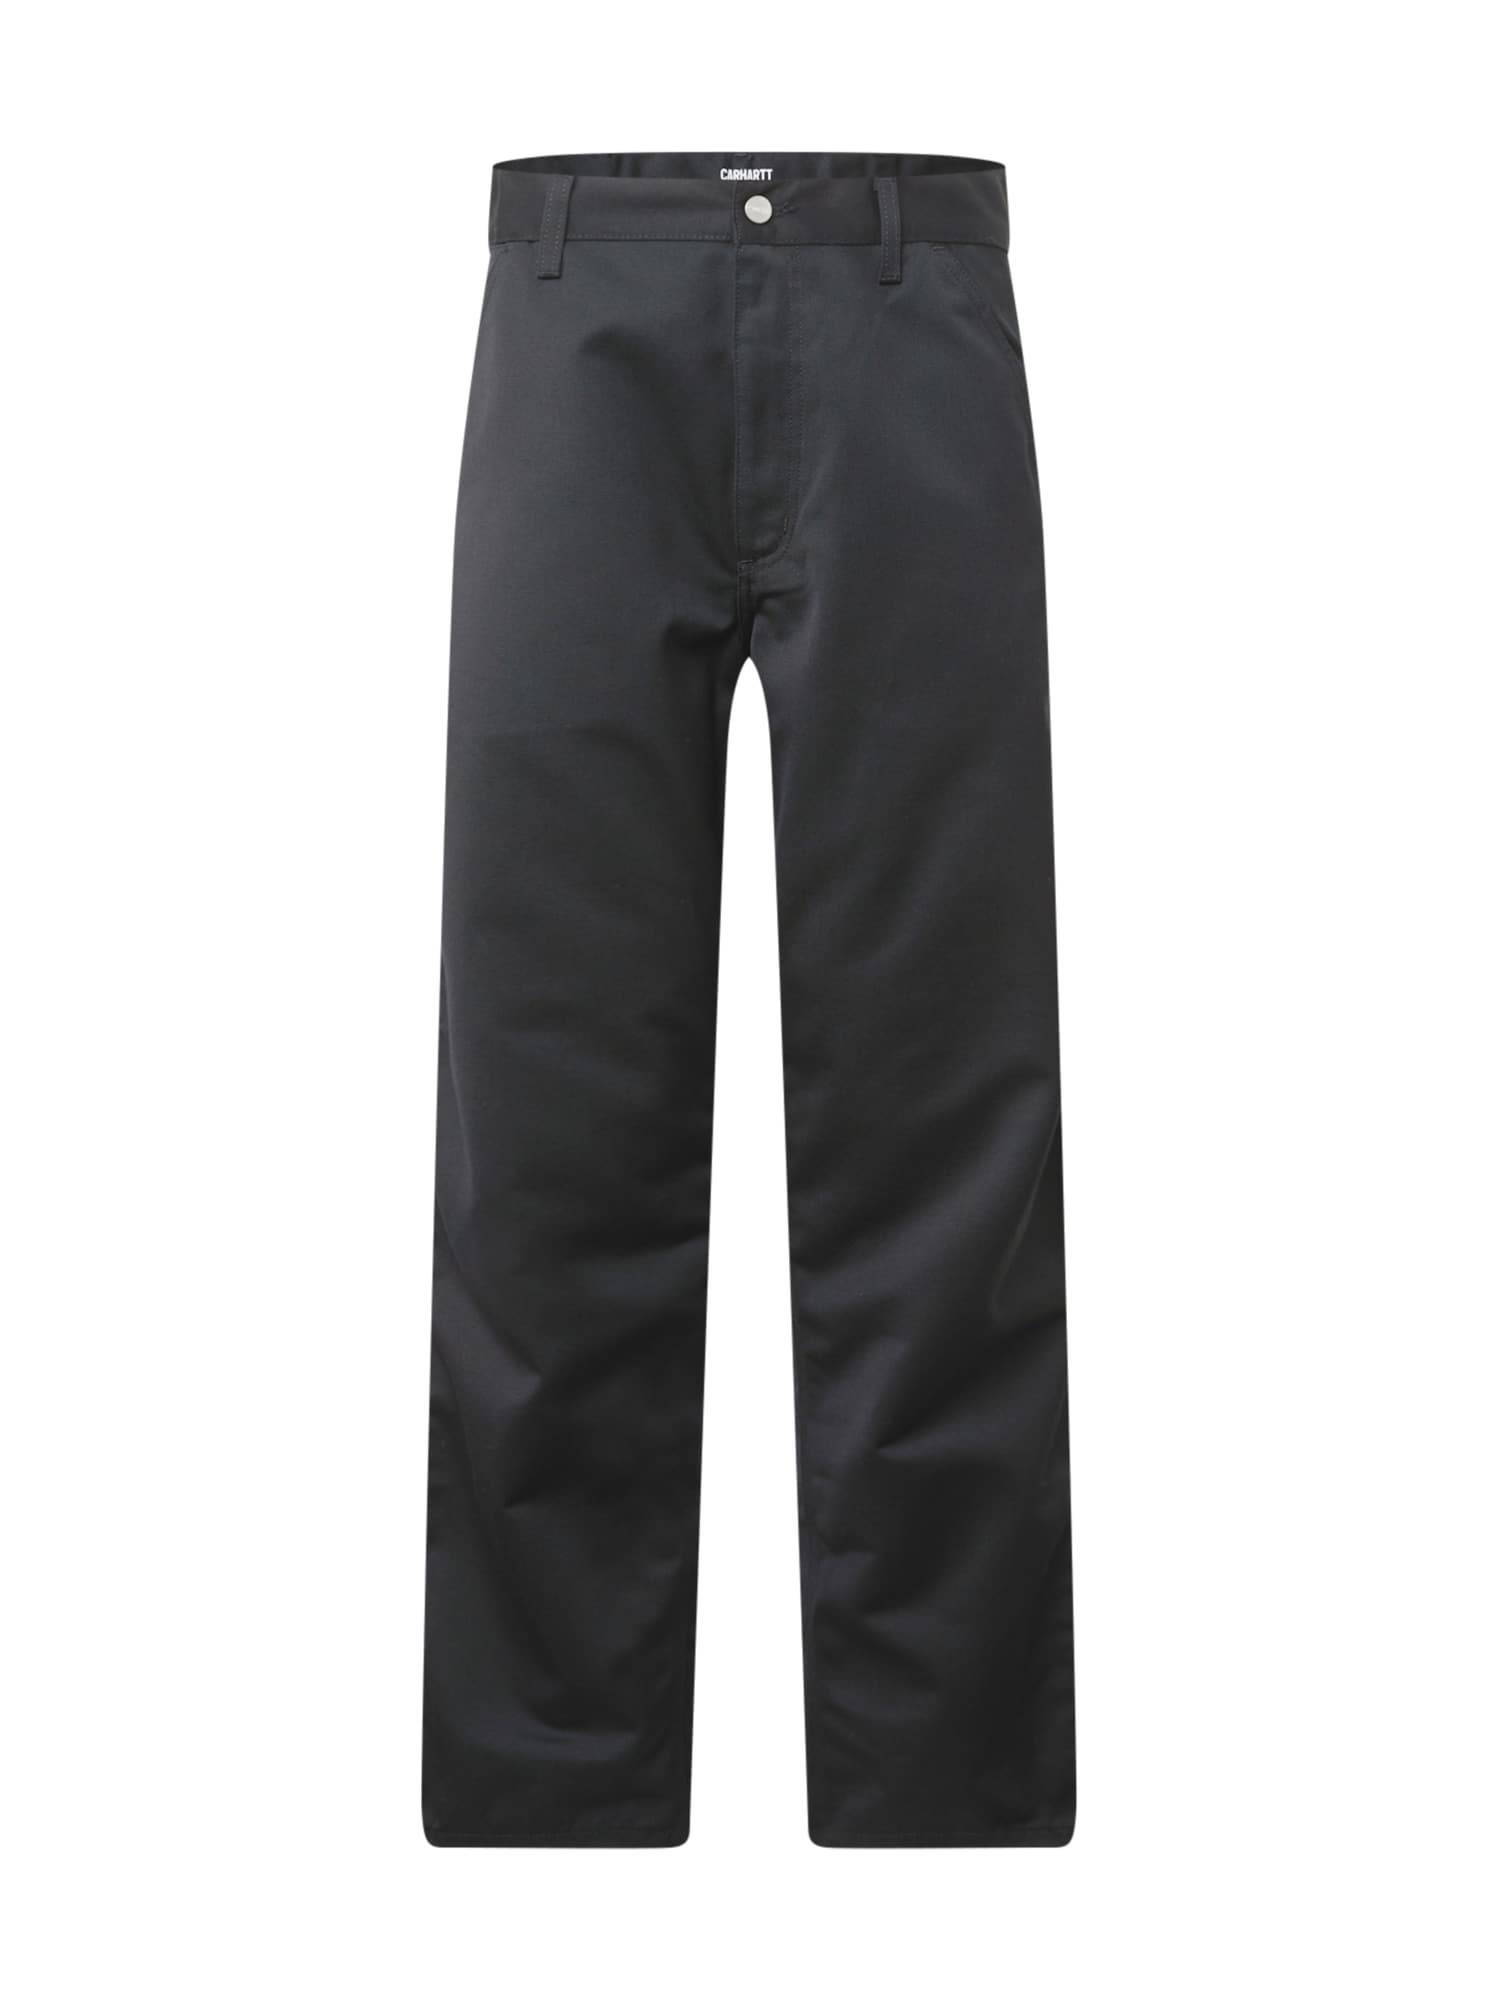 Carhartt WIP Pantalon 'Simple Pant'  - Noir - Taille: 32 - male